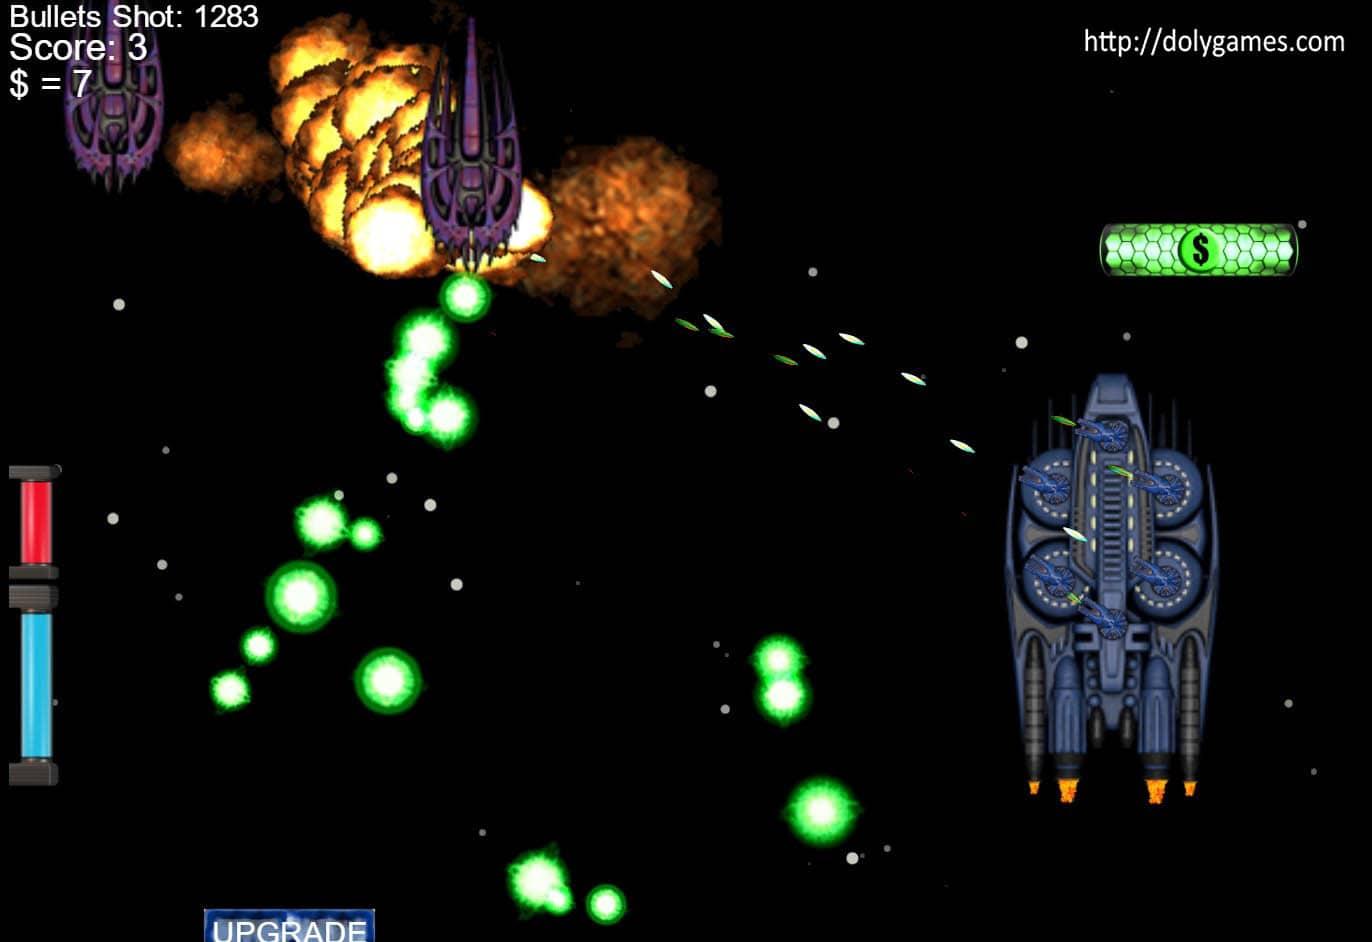 COSMOS's Starship Shooter game screenshot. DolyGames